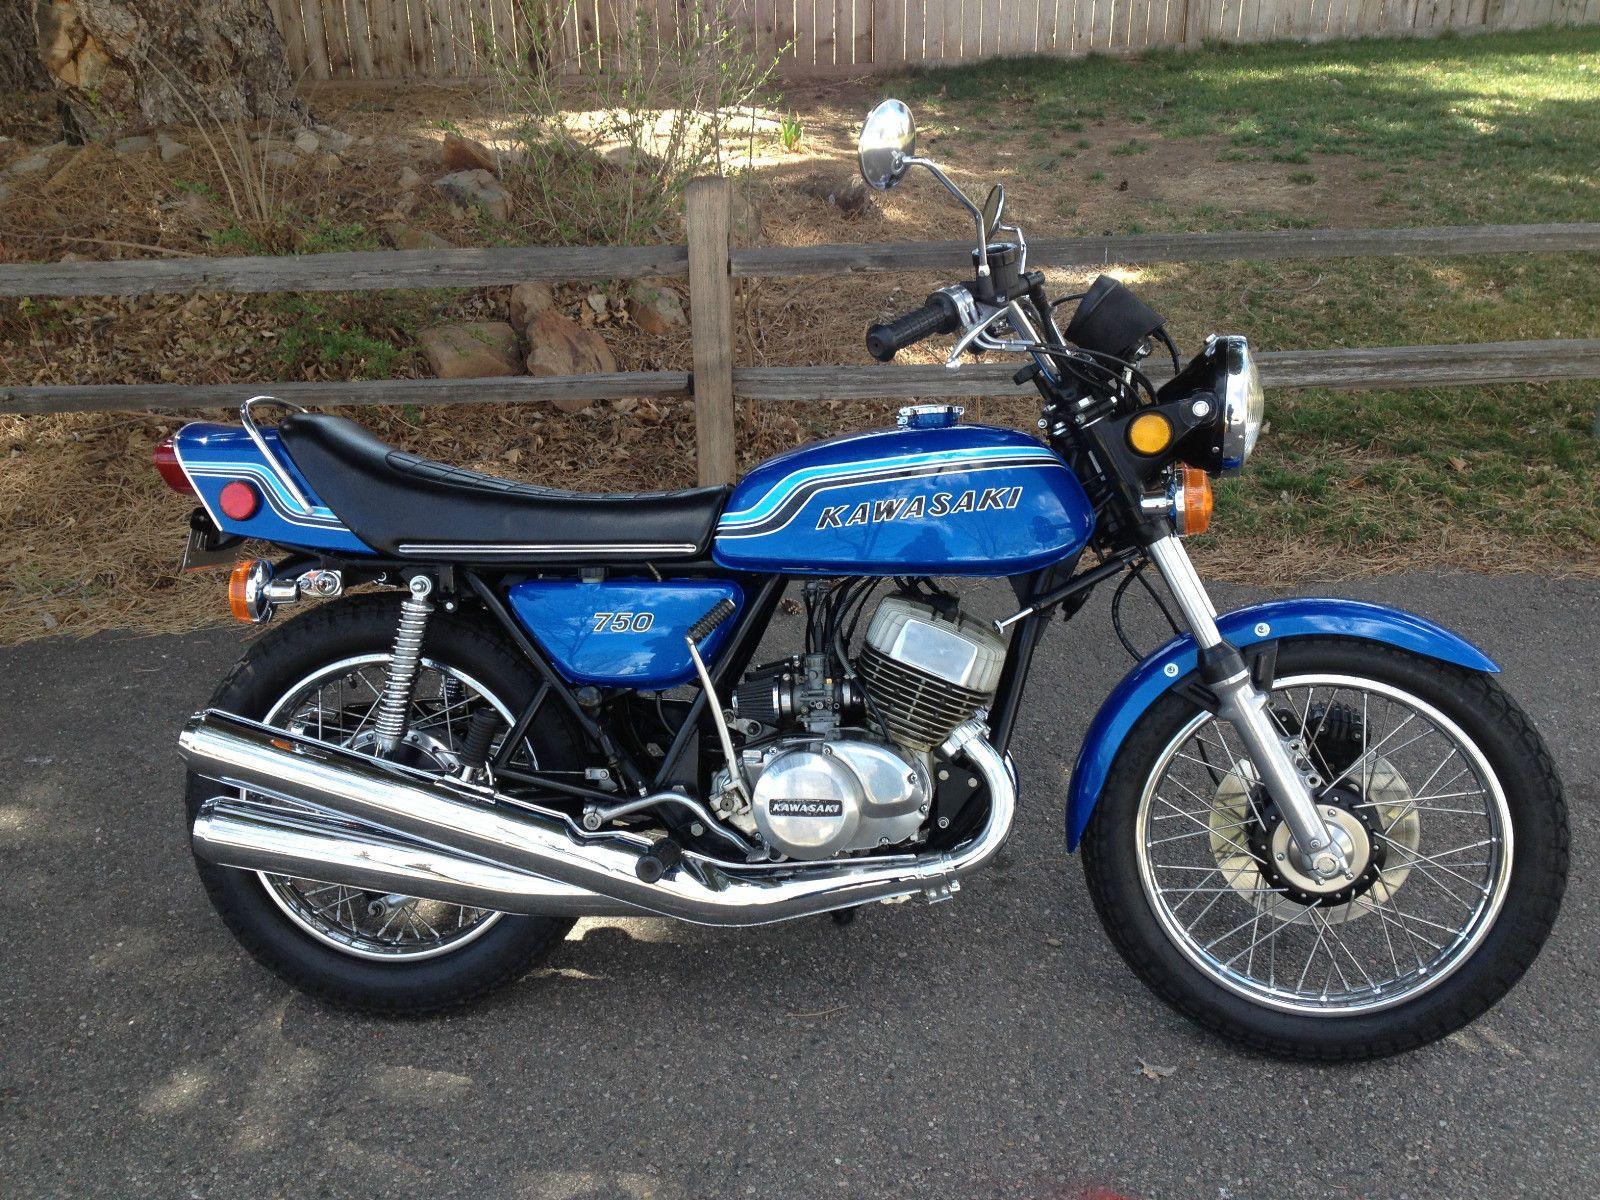 1972 Kawasaki H2 750 Triple, there ya go Gunner | MOTORCYLES ...